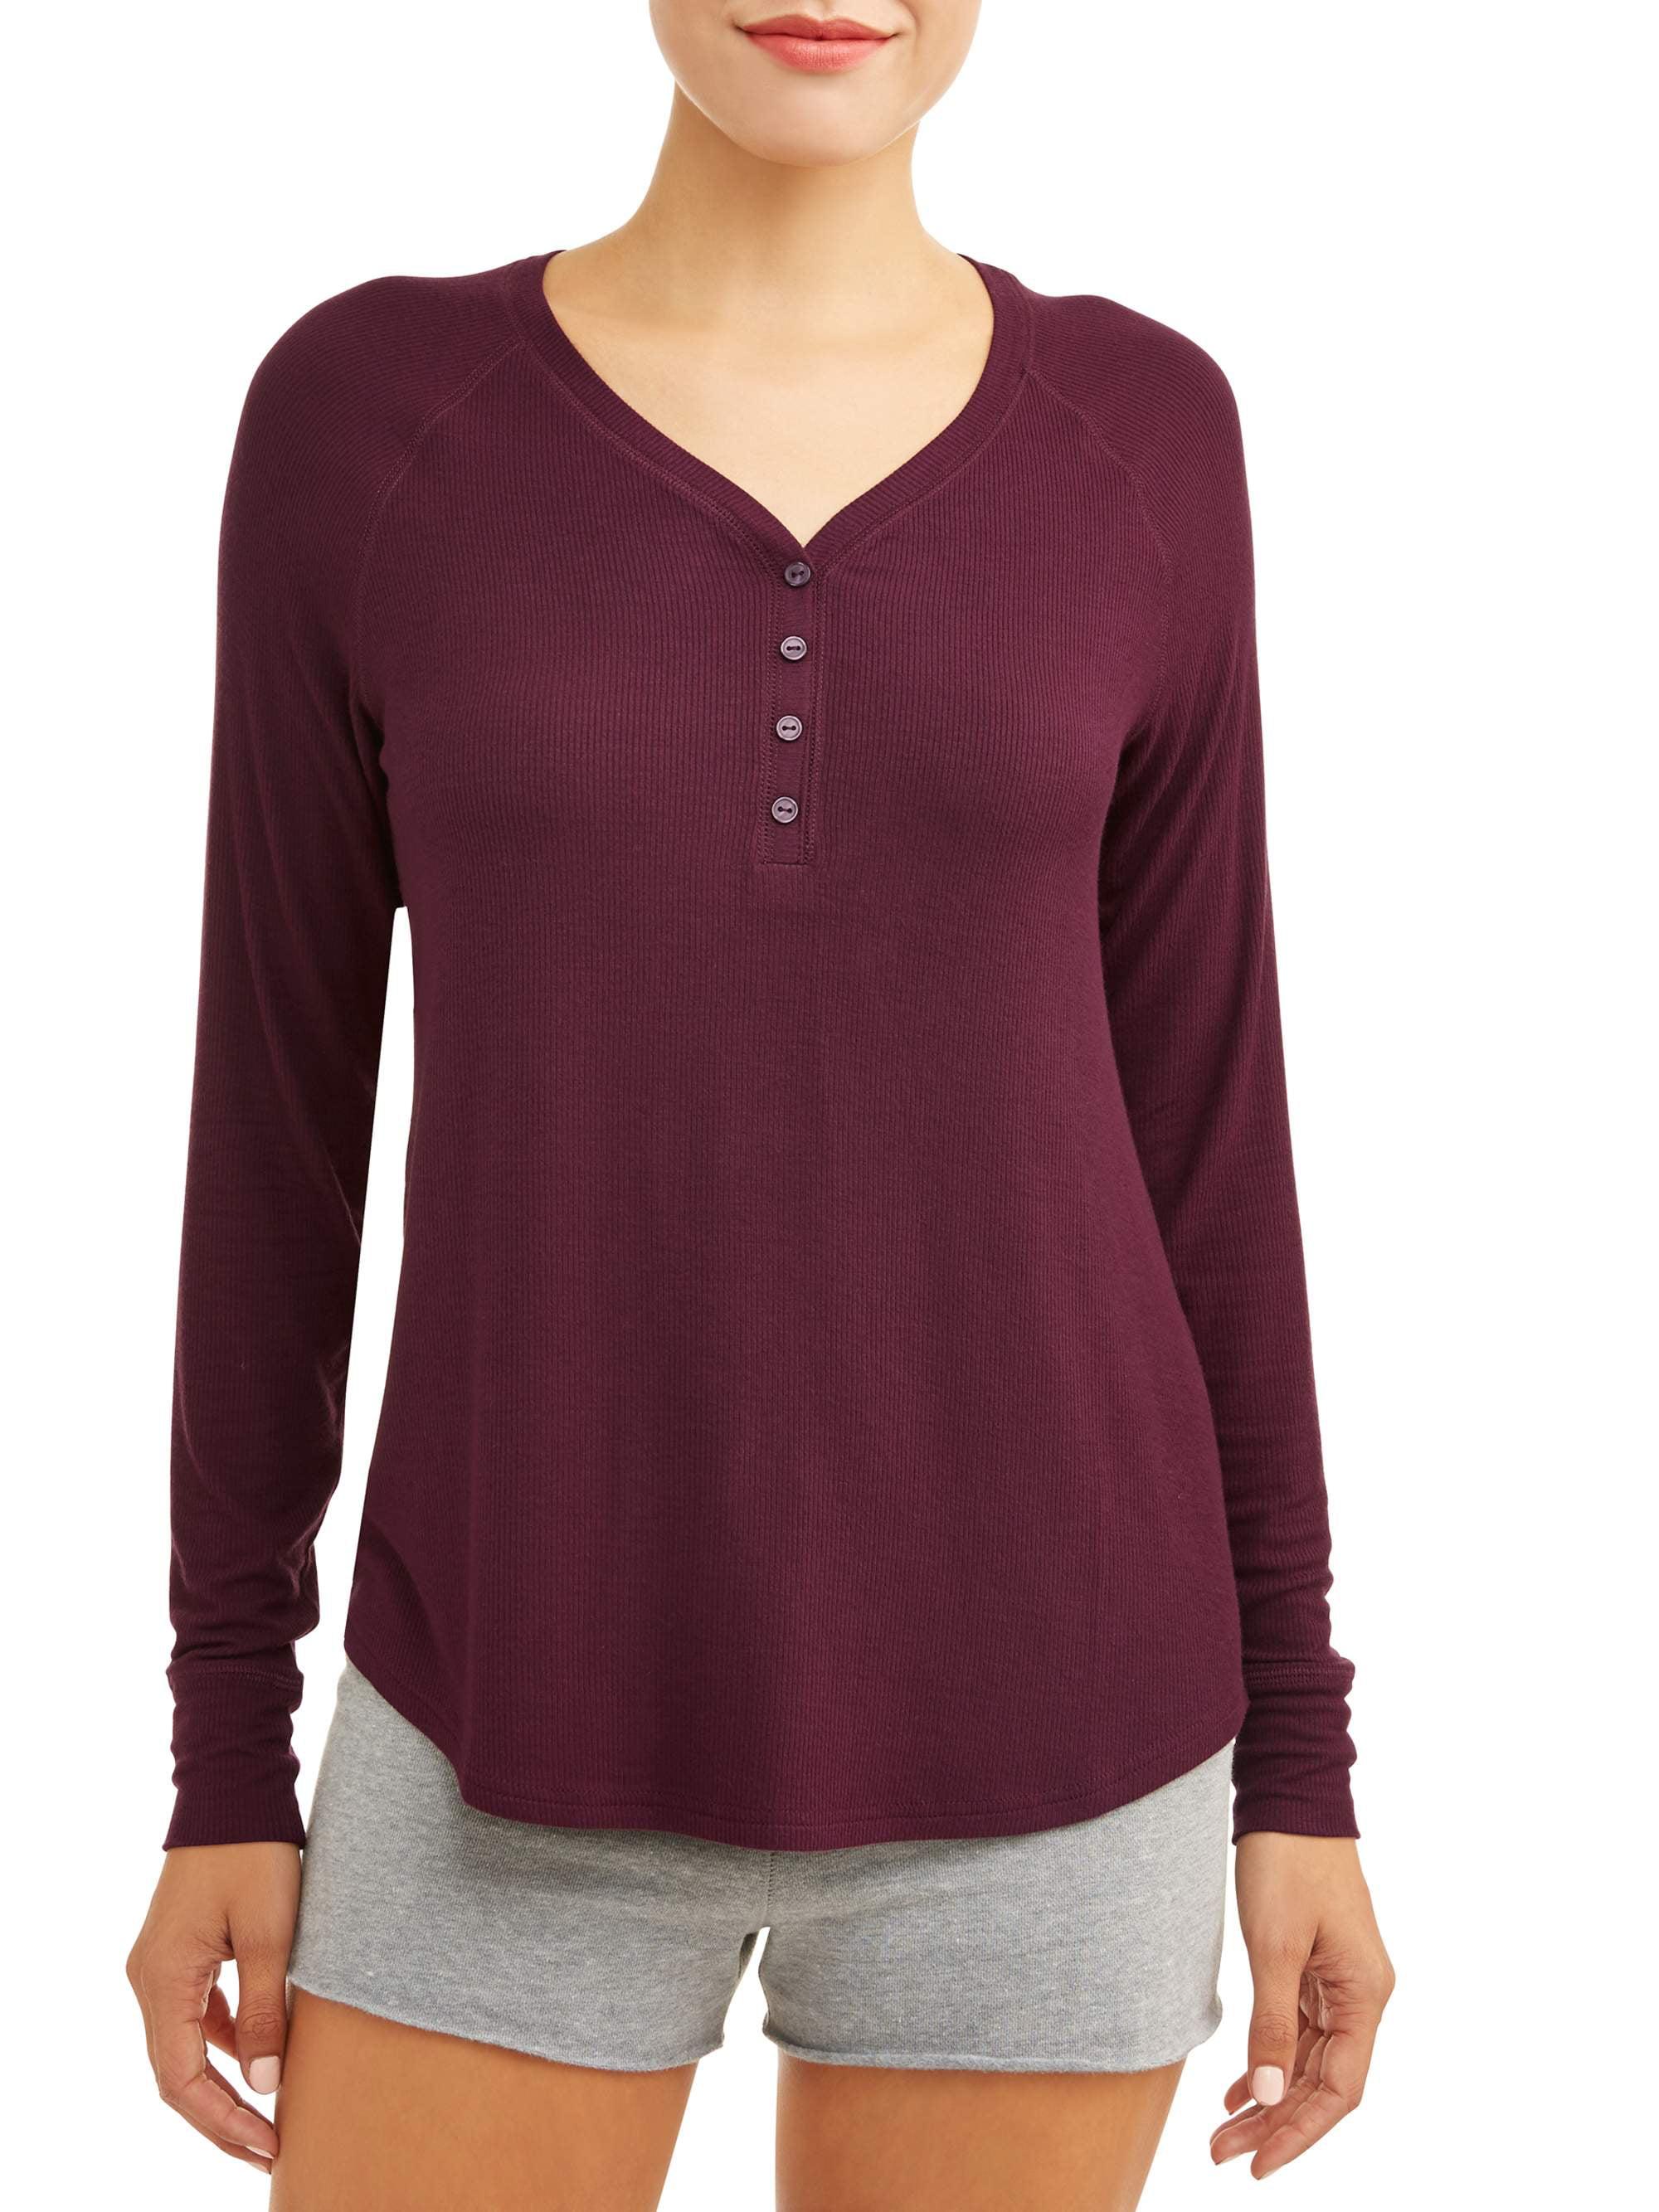 43063acac4cdc Secret Treasures - Secret Treasures Essentials Women s Long Sleeve Sleep  Rib Henley Top - Walmart.com